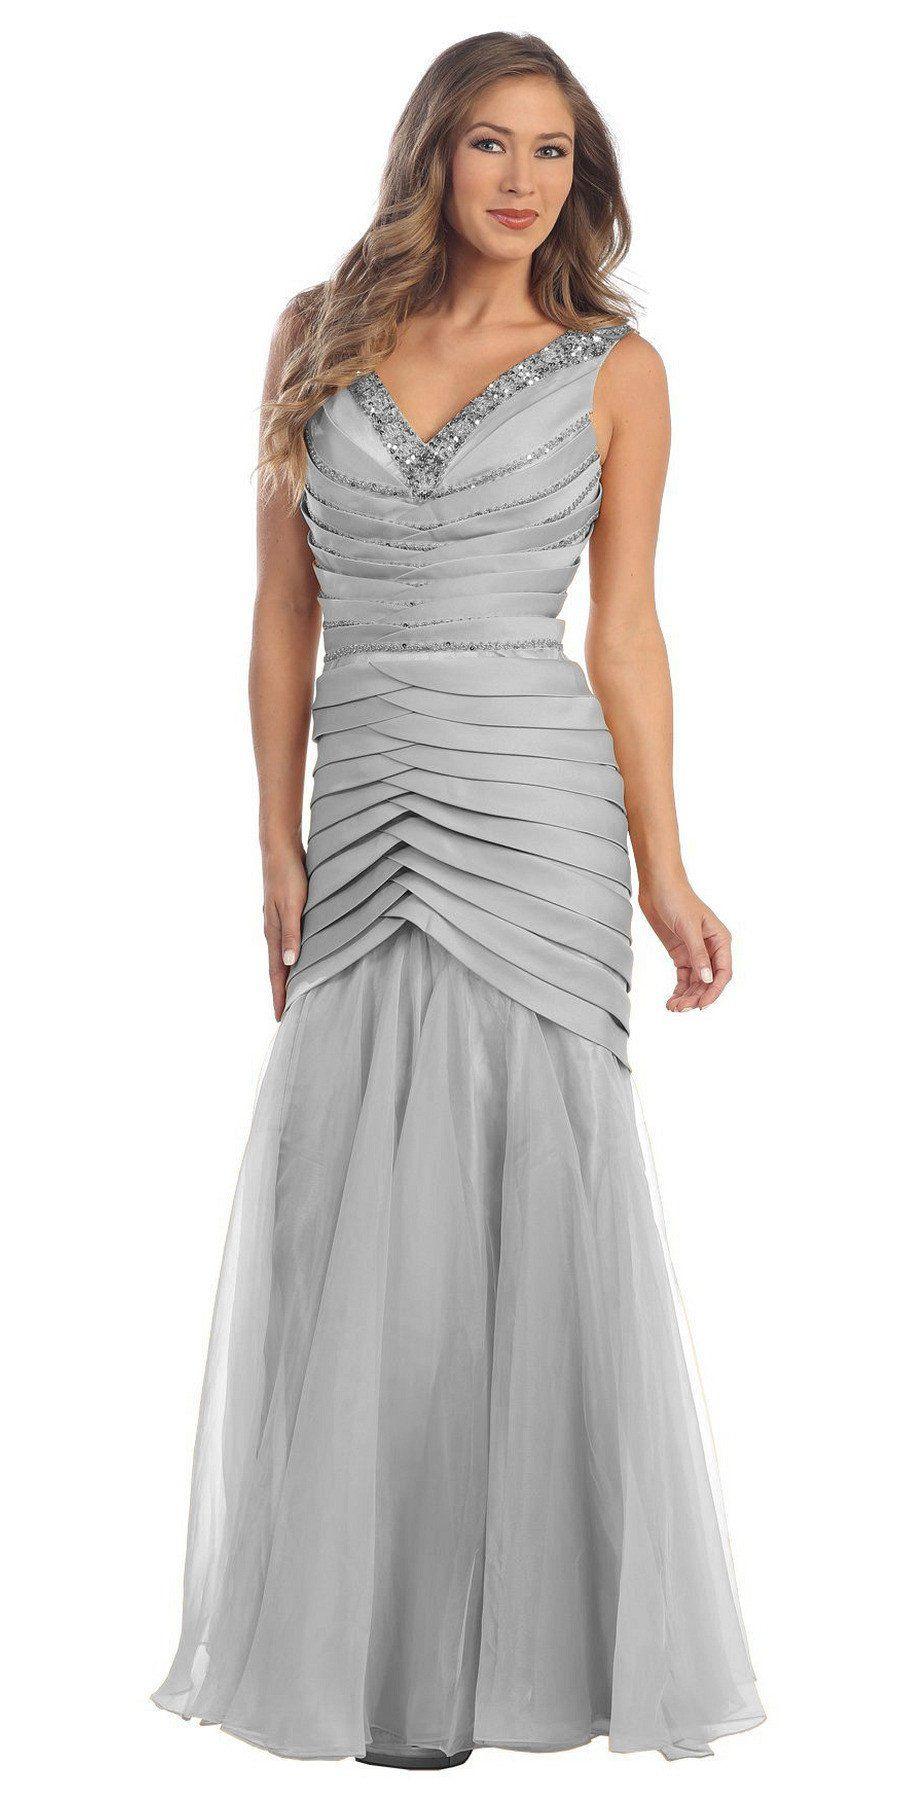 Long formal off white prom dress mermaid vneck flare satin chiffon